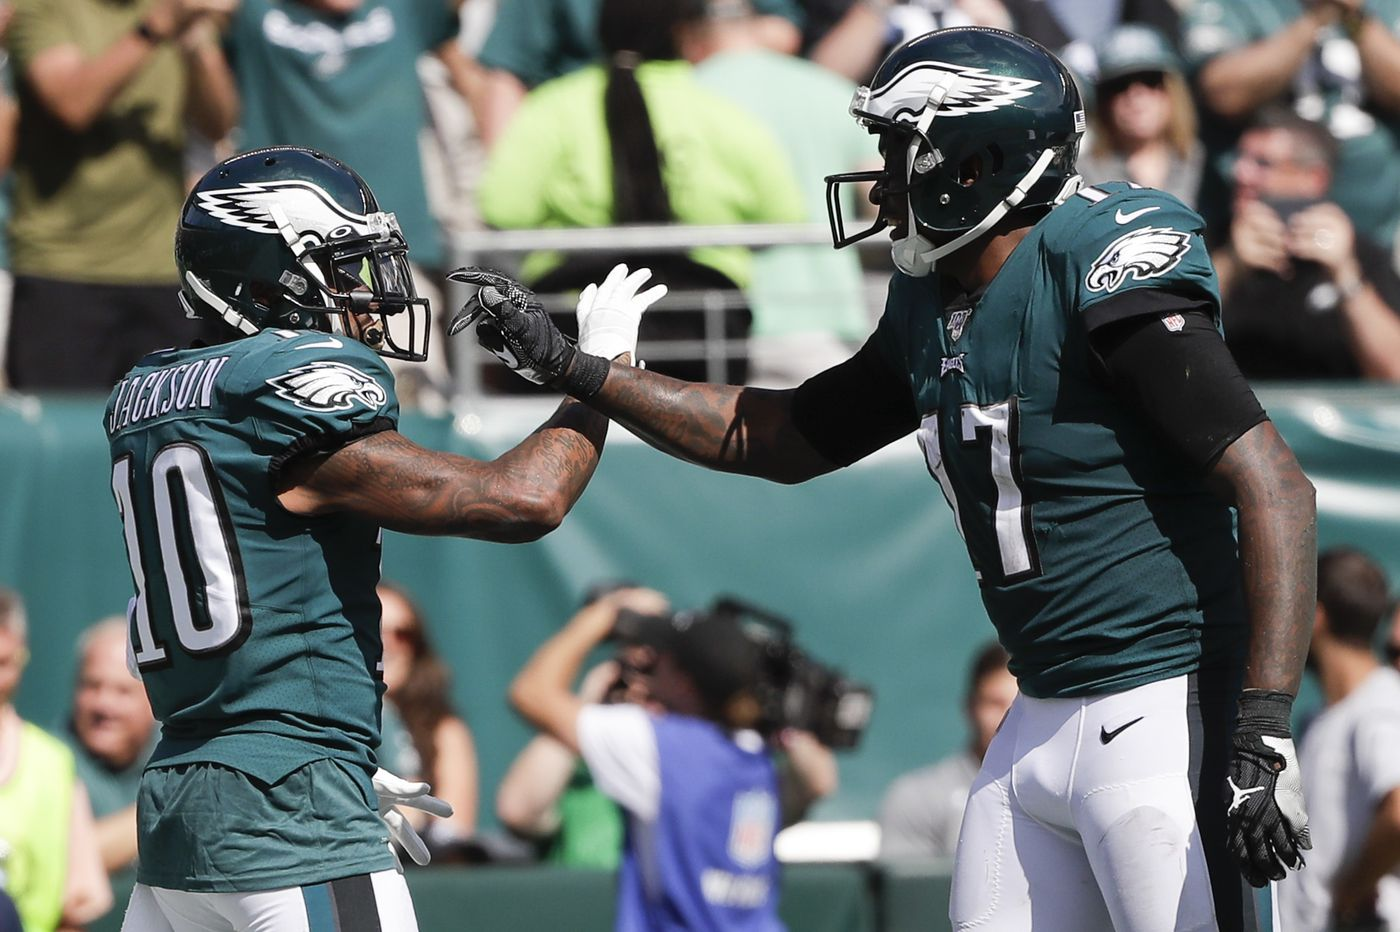 DeSean Jackson, Carson Wentz lead Eagles to 32-27 victory over Redskins in season opener